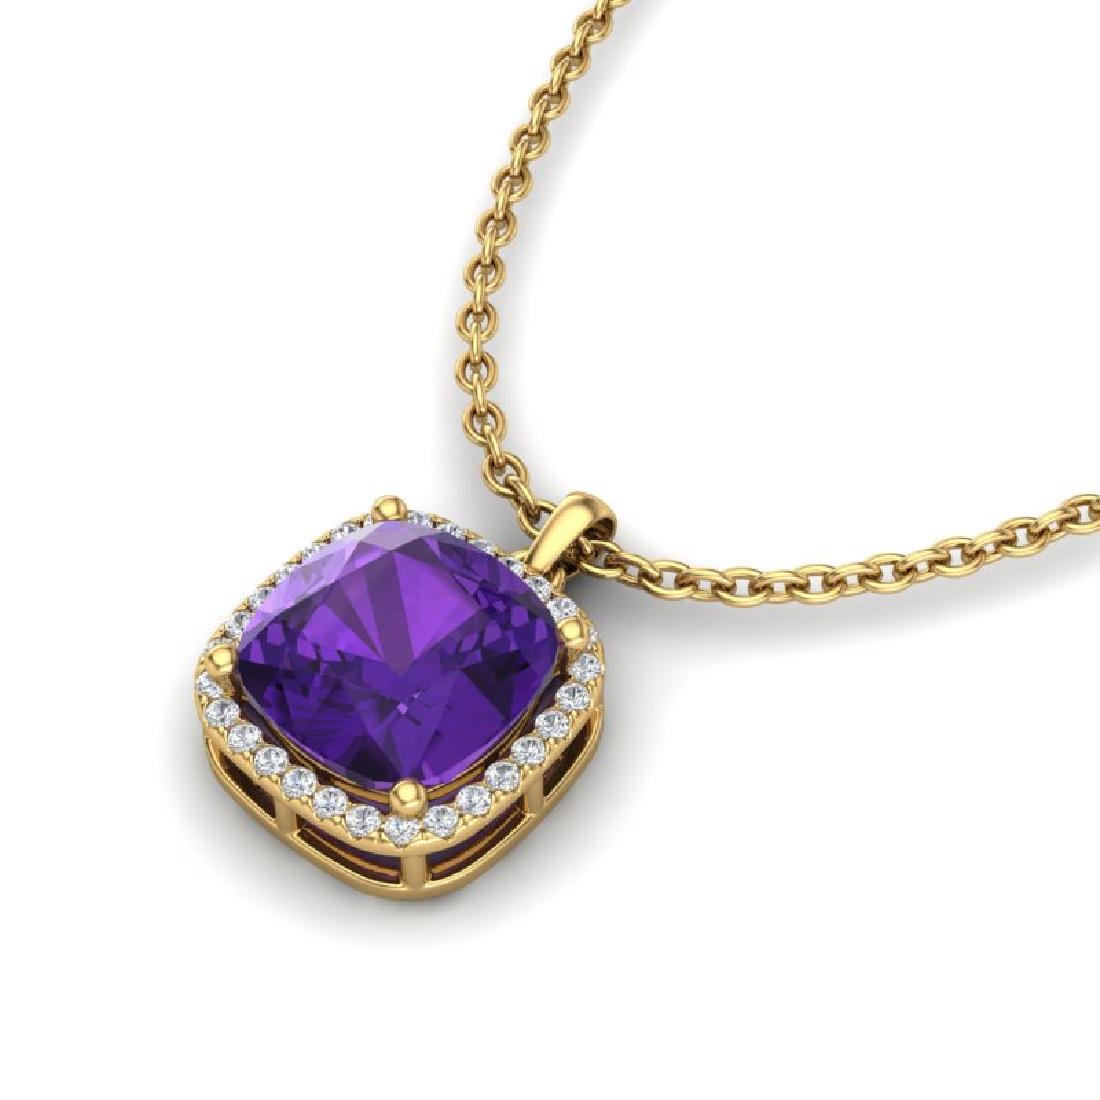 6 CTW Amethyst & Micro Pave Halo VS/SI Diamond Necklace